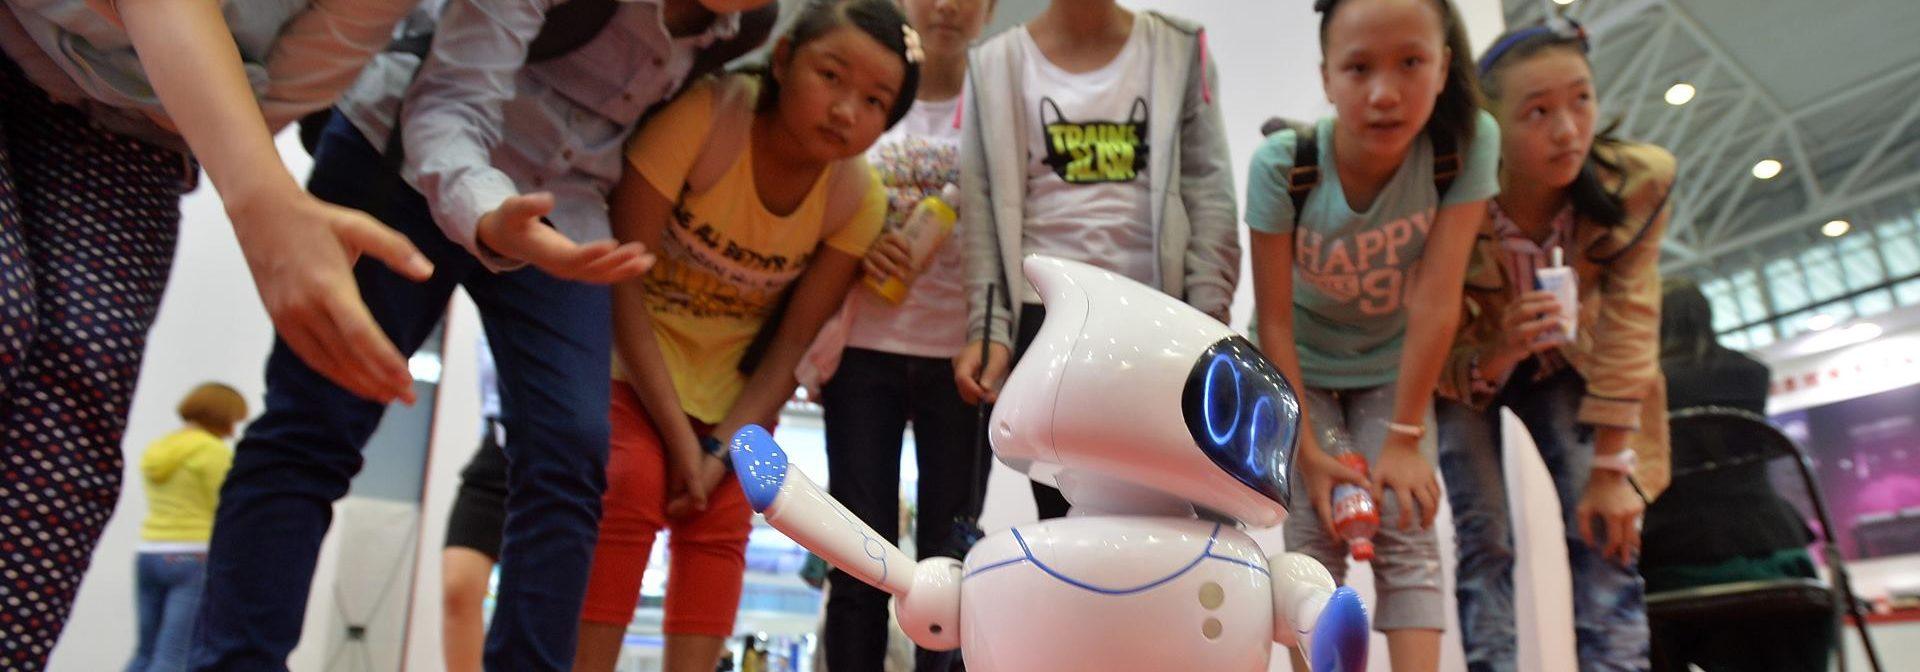 NAJNOVIJA TEHNOLOGIJA Počeo treći po redu 'China Science & Technology Expo'